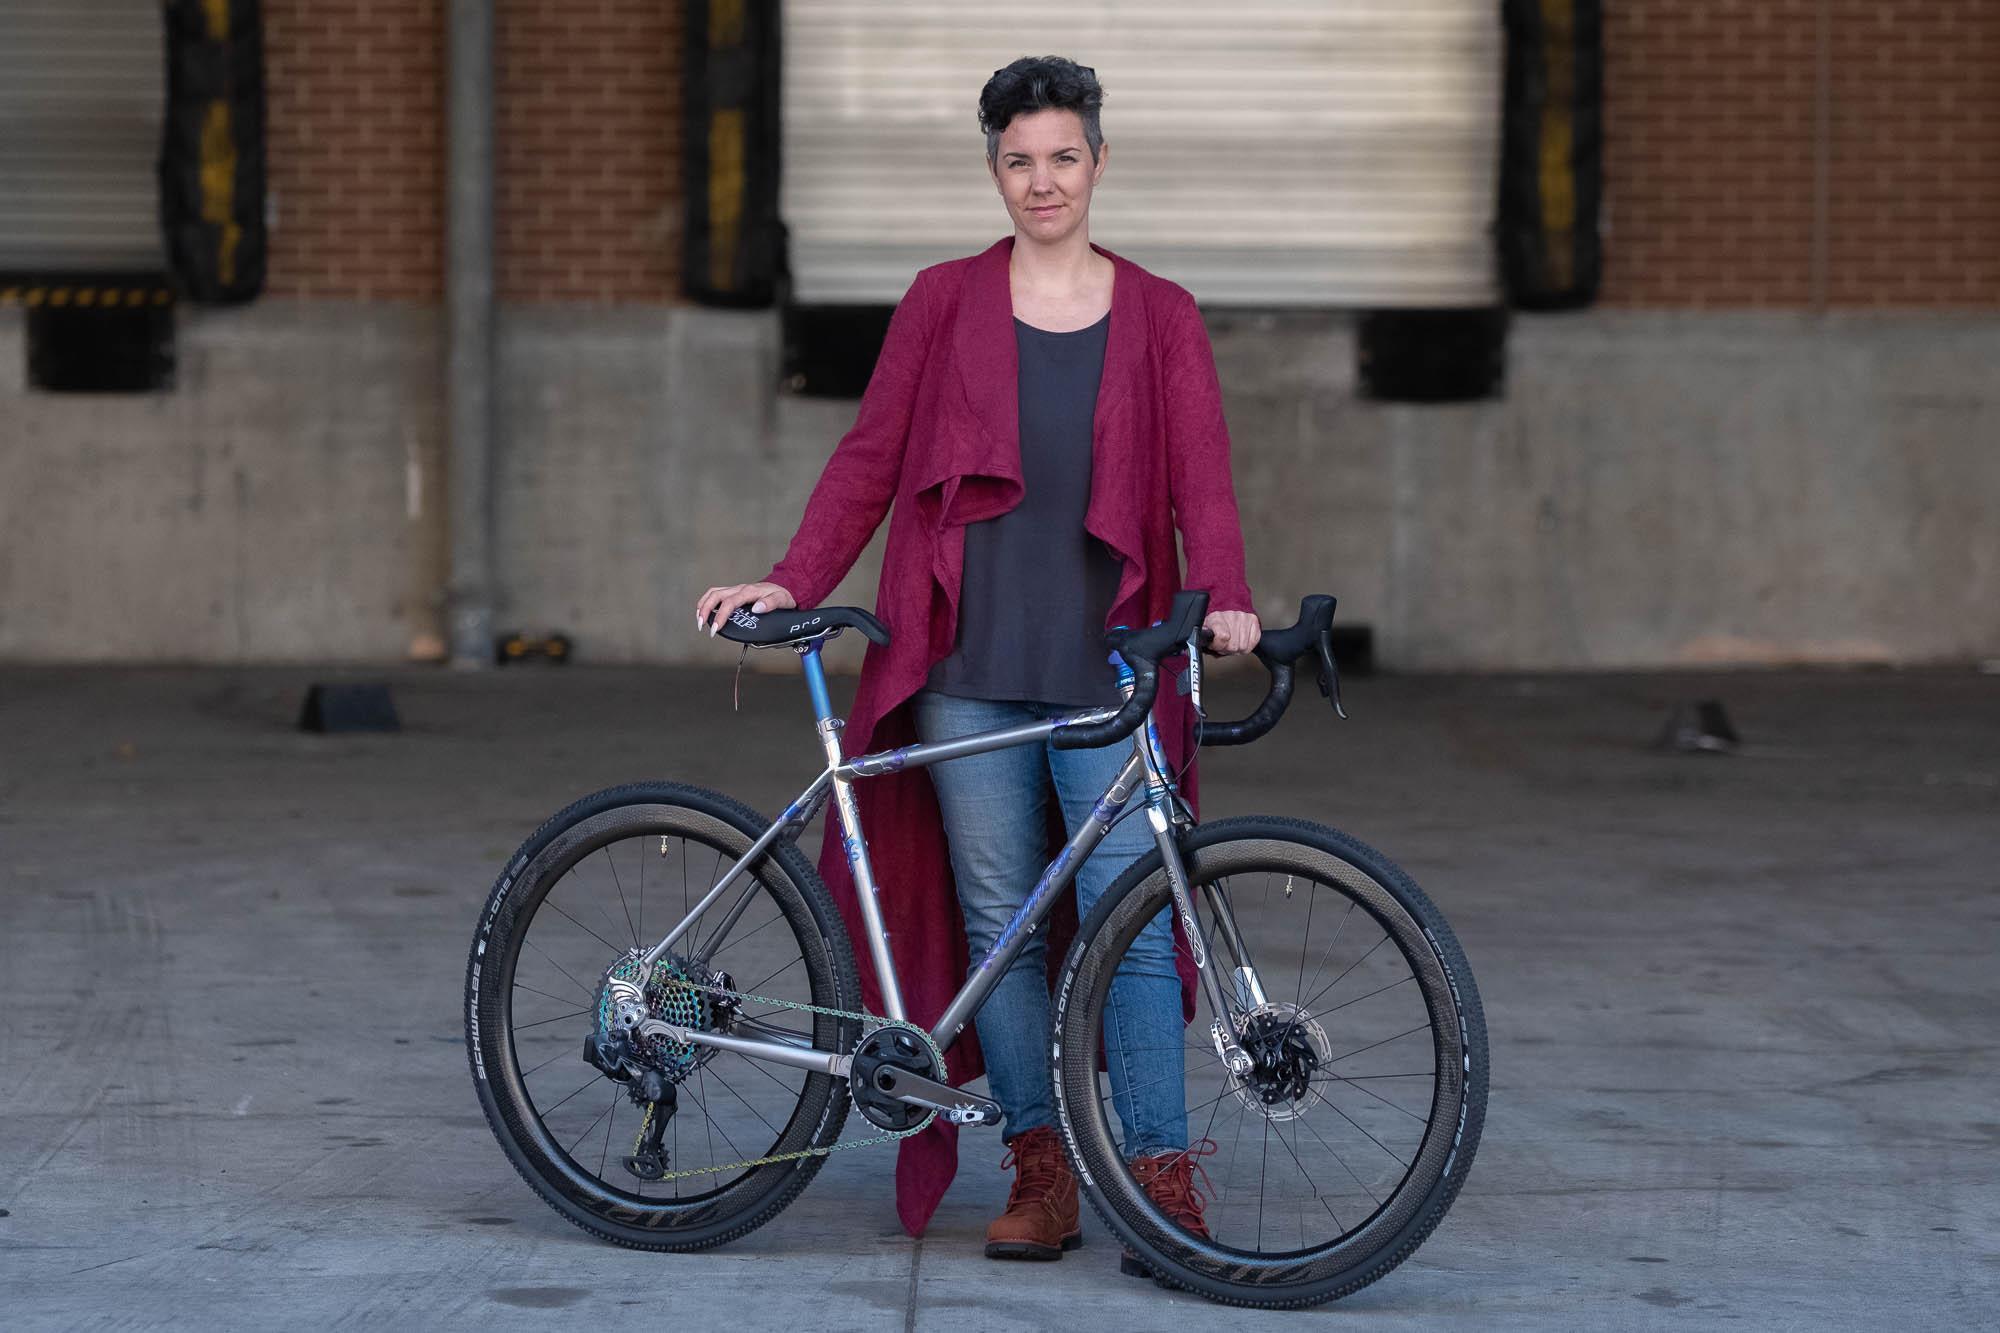 Philly Bike Expo-Julie Ann Pedalino